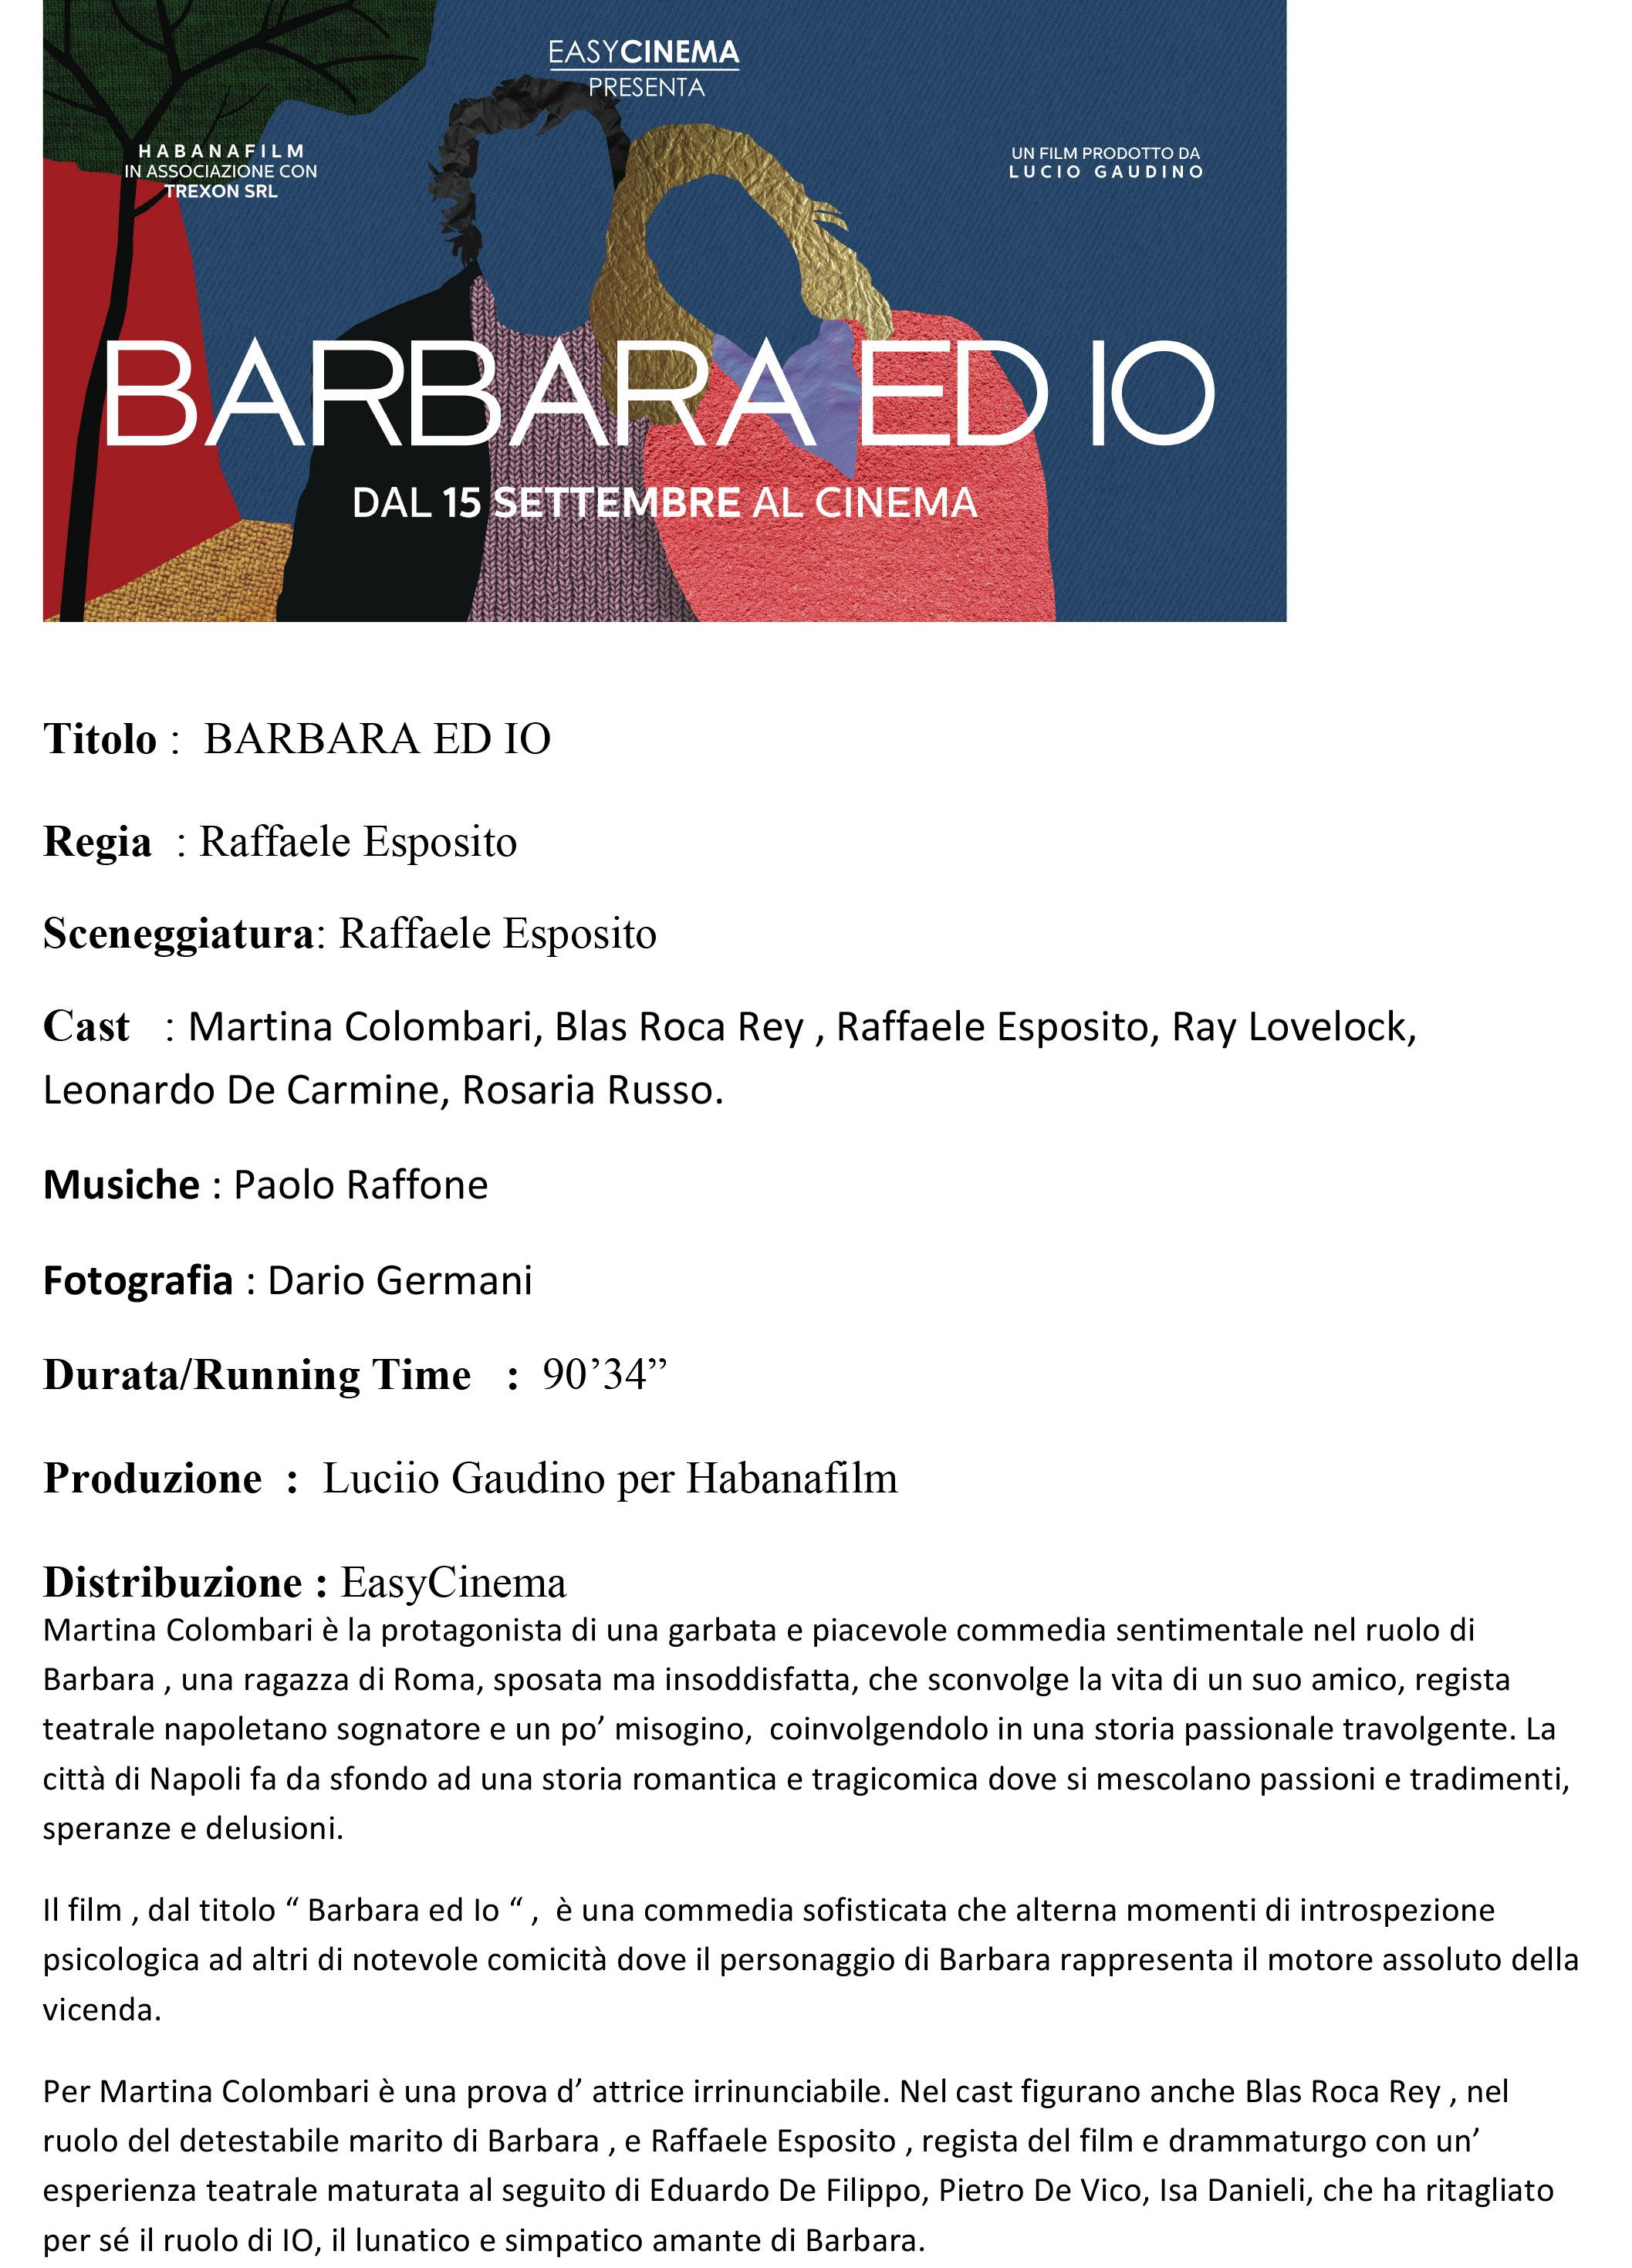 Microsoft Word - Barbara ed Io(1).docx